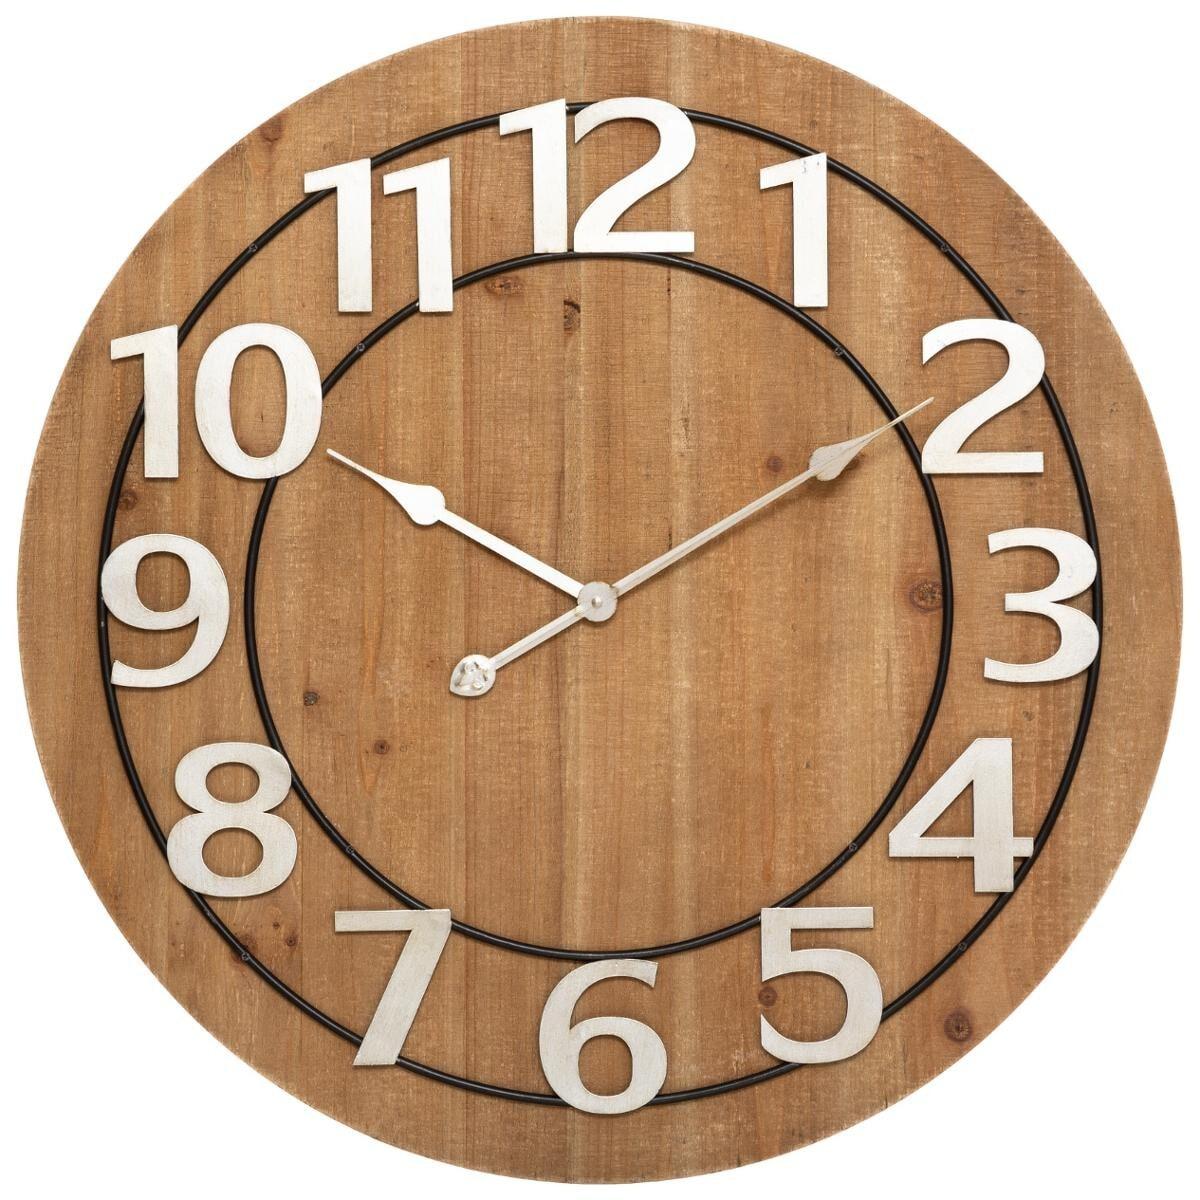 Horloge 'Hailey' D68 cm marron